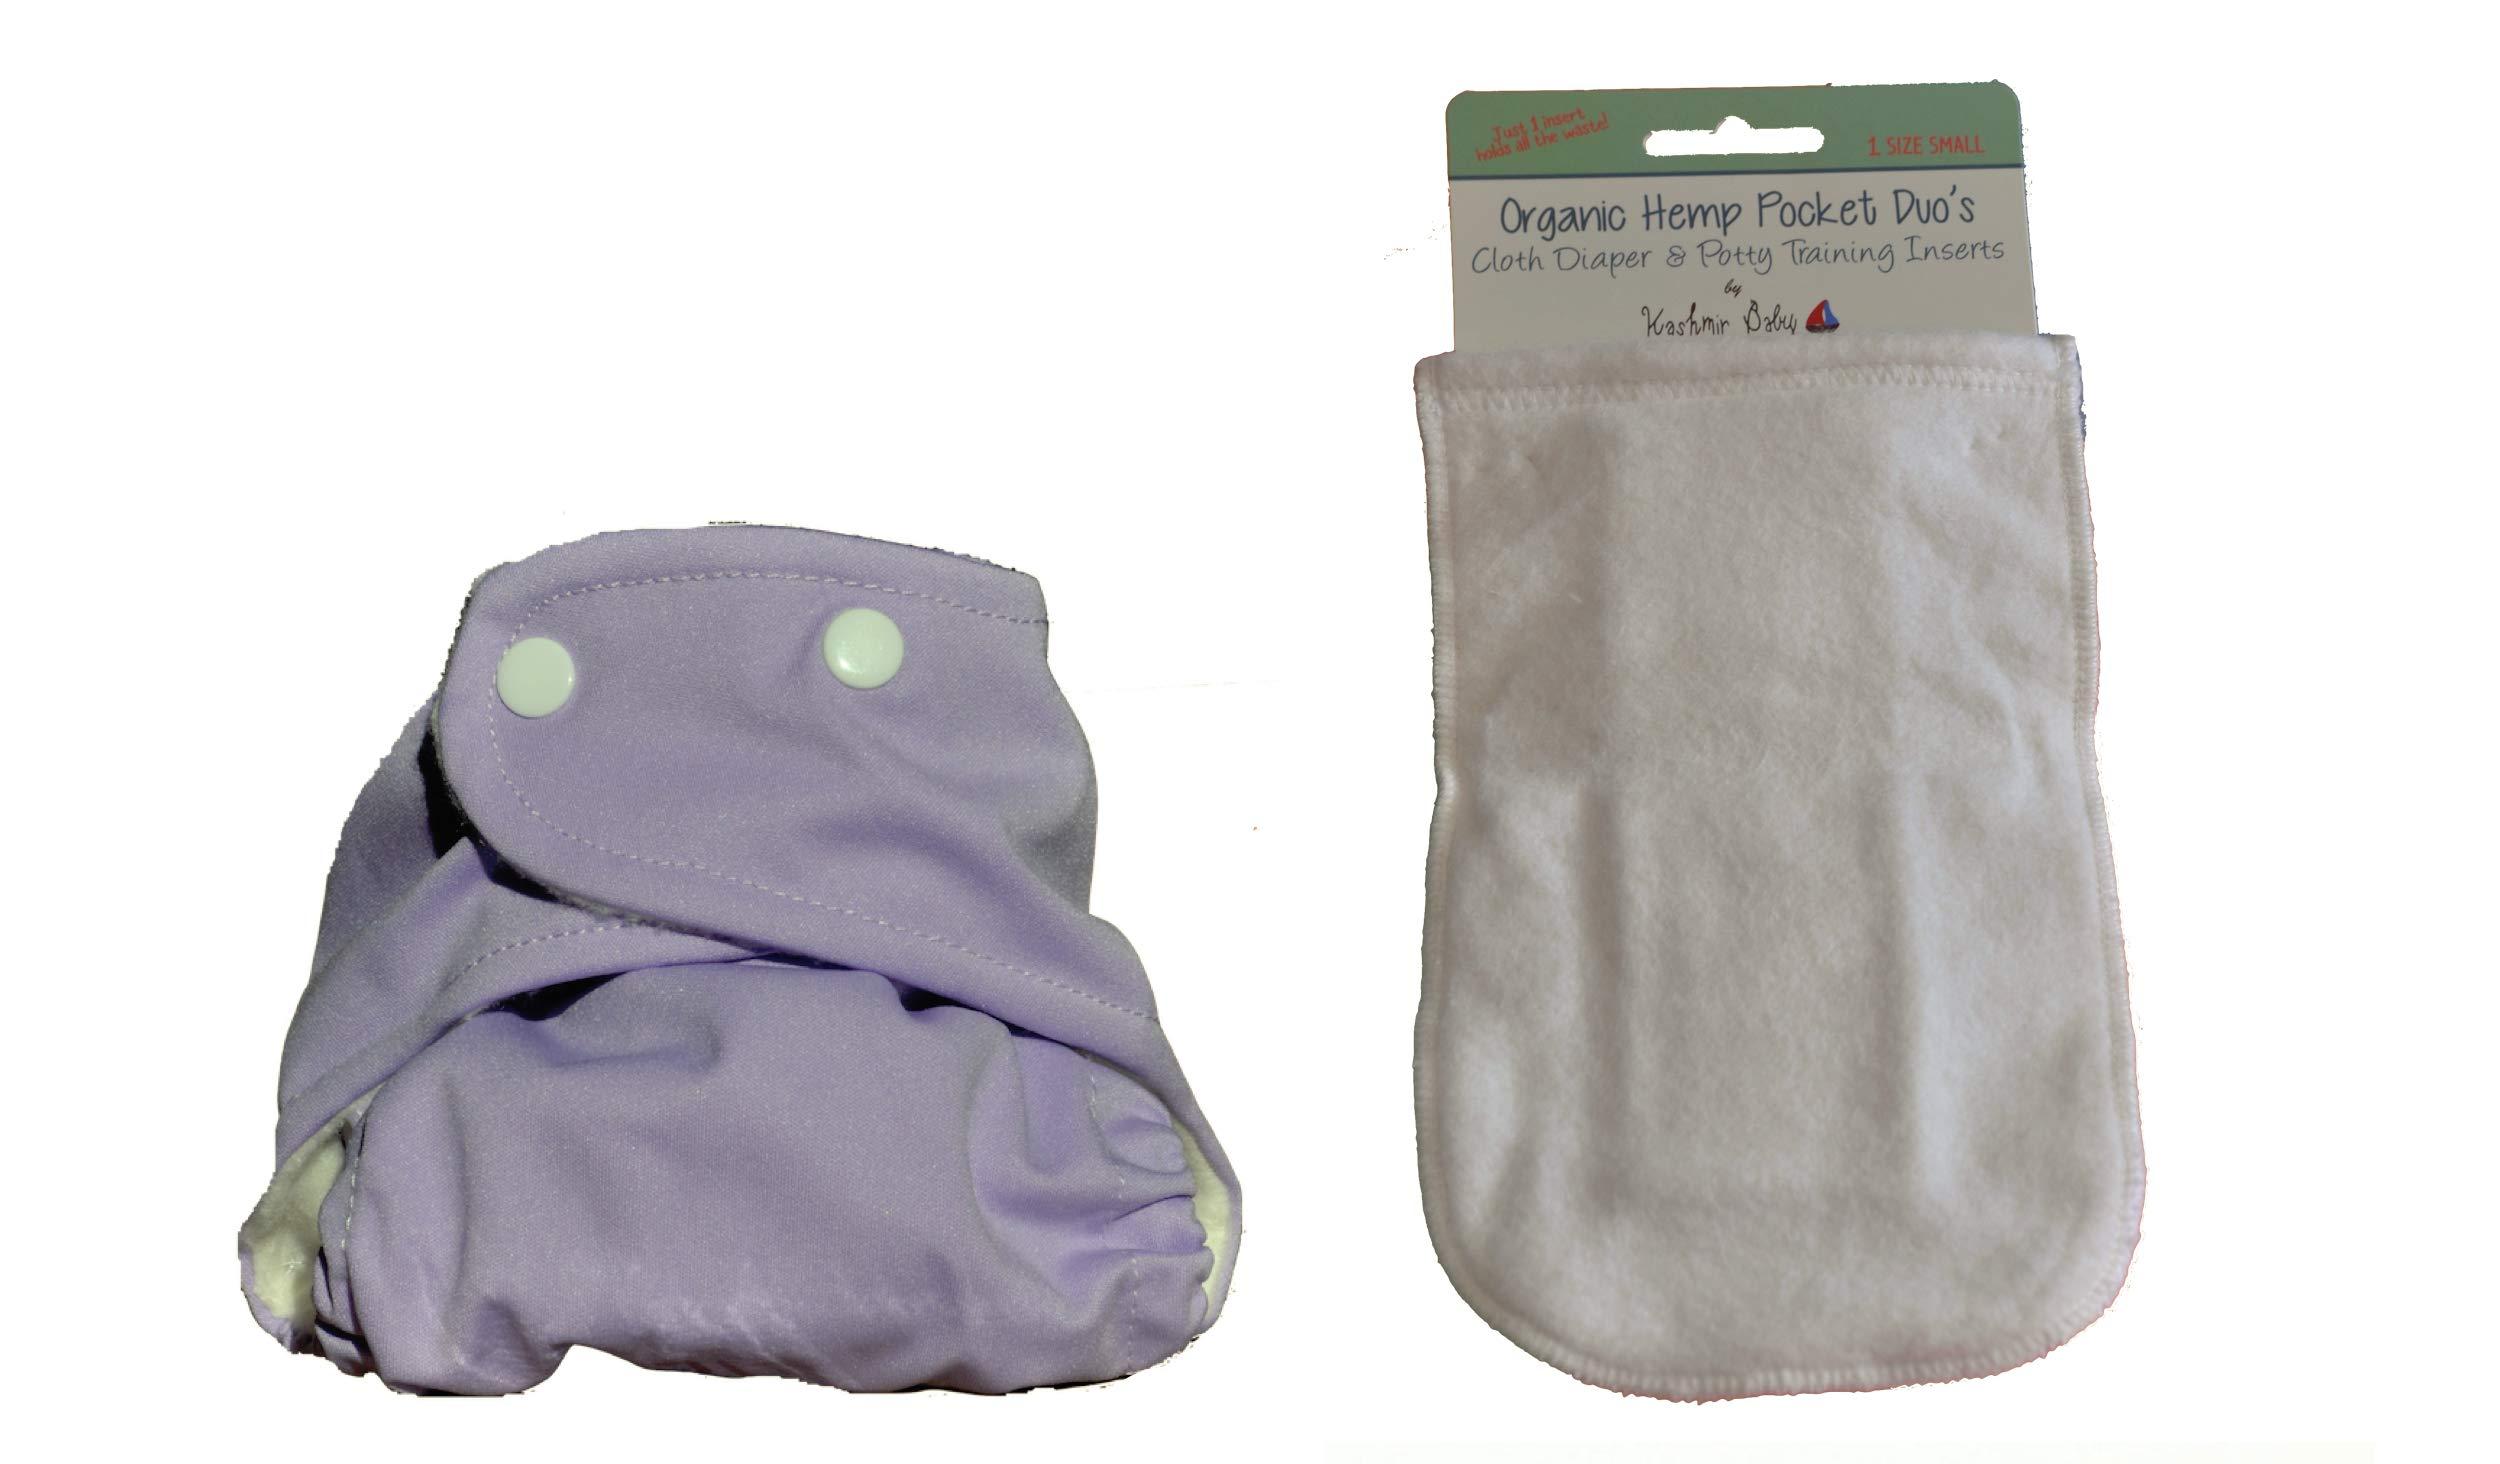 Kashmir Baby Hemp/Organic One Size Diaper, Hemp Insert -Lavender snap by Kashmir Baby